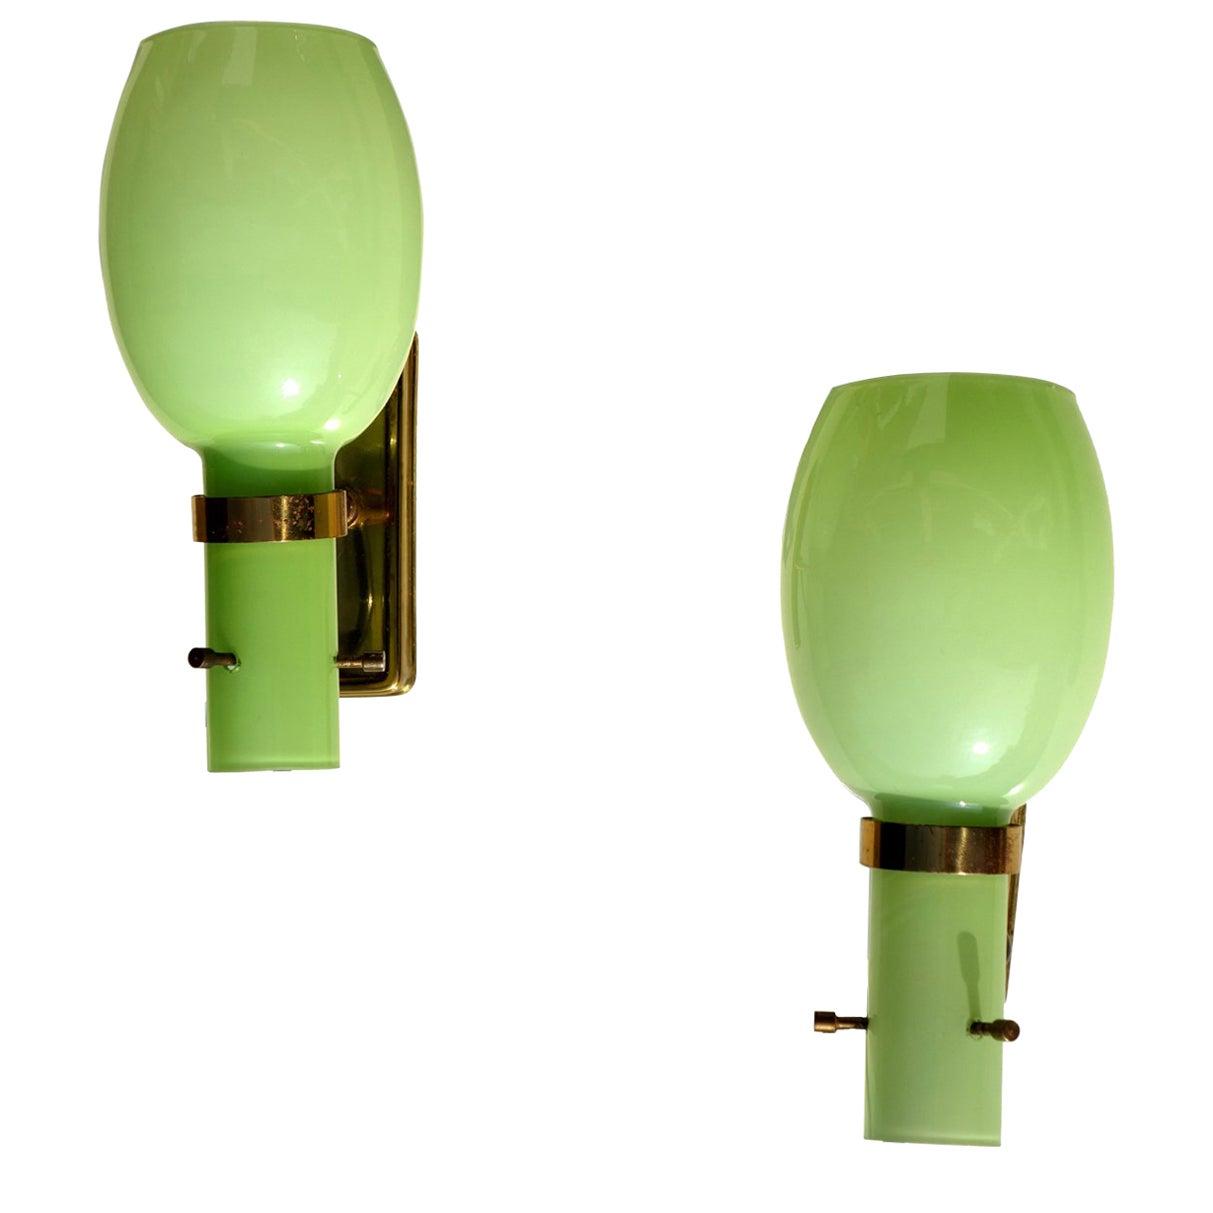 1950s by Stilnovo Italian Midcentury Design Pair of Wall Lamps